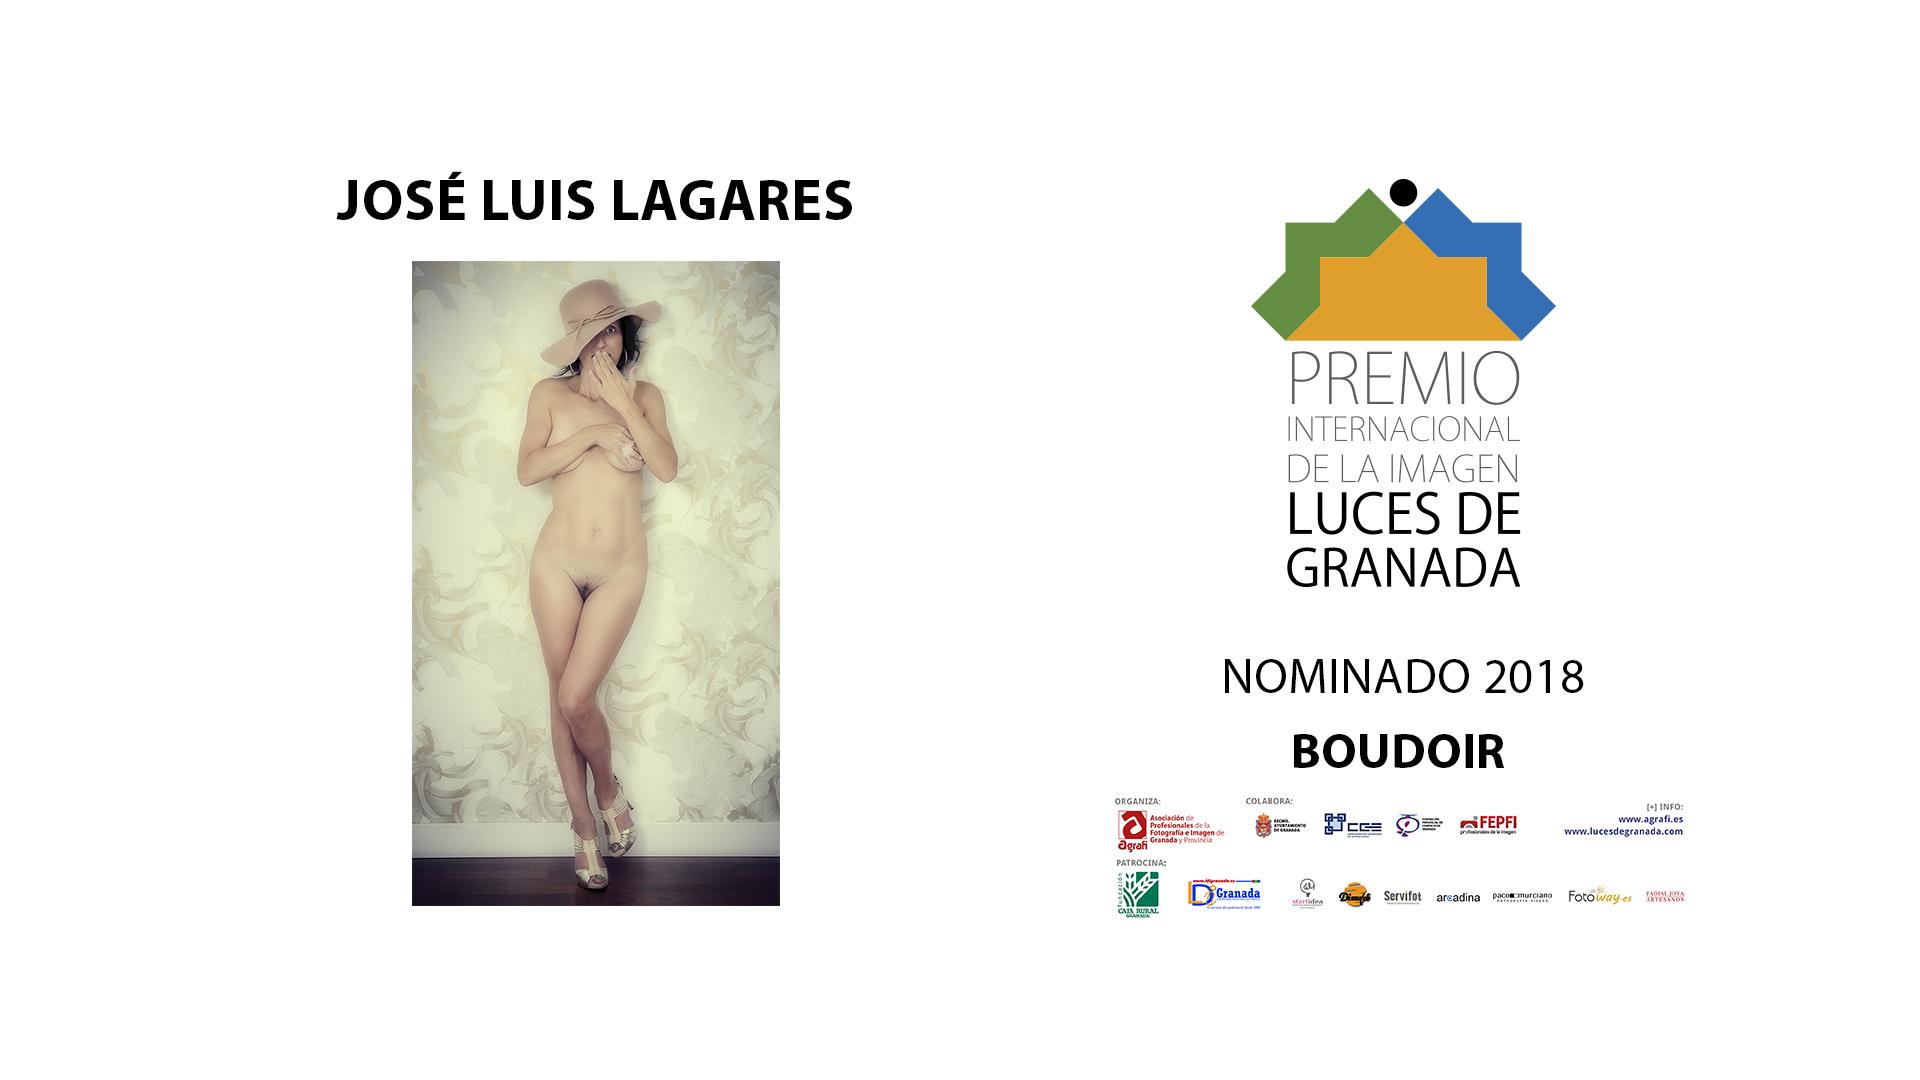 BD_JOSE_LUIS_LAGARES